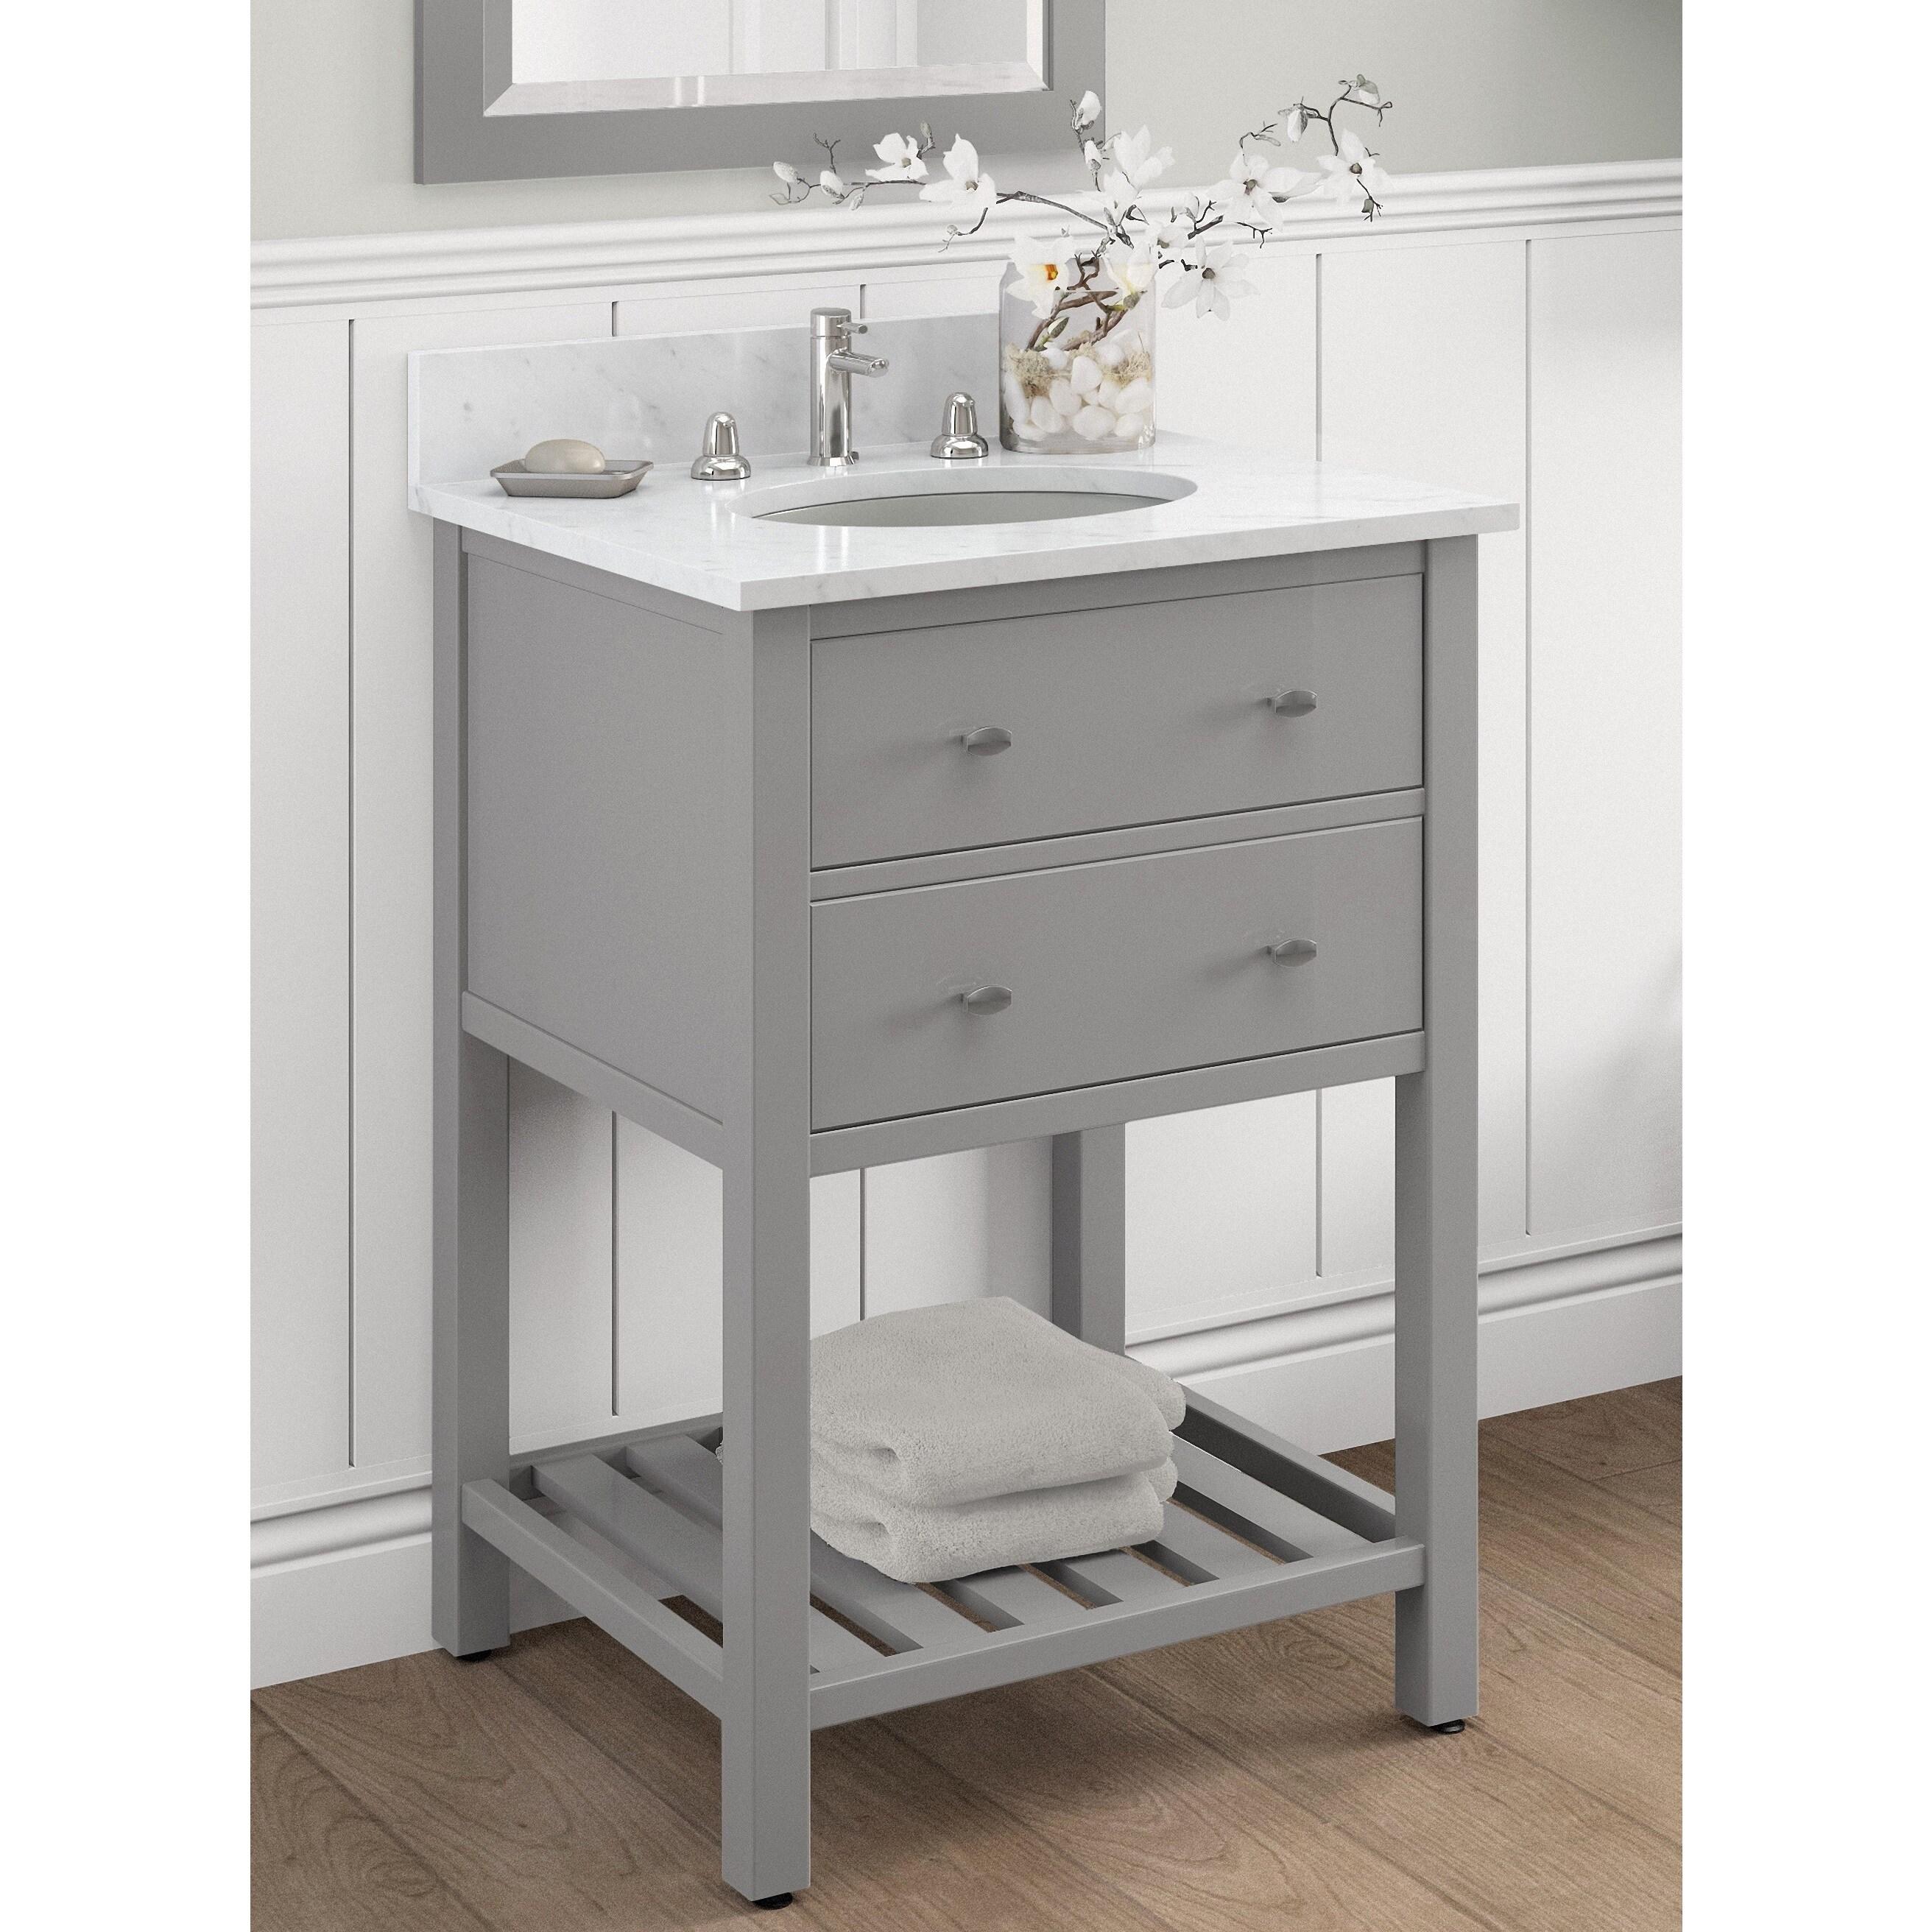 alaterre harrison carrera marble sink top with grey 24-inch bath